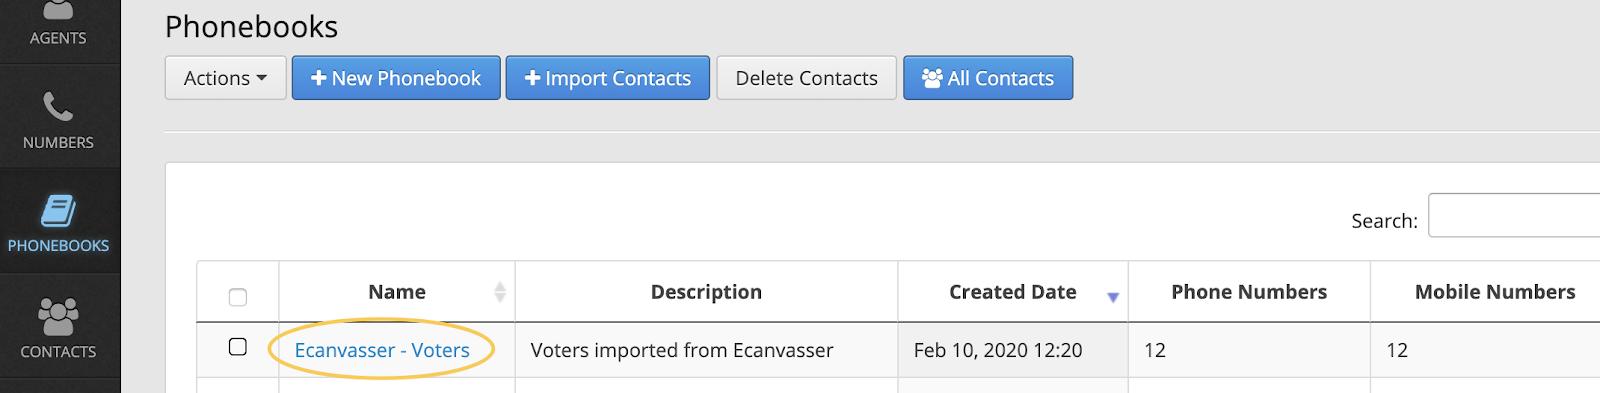 phone canvassing callhub ecanvasser contacts